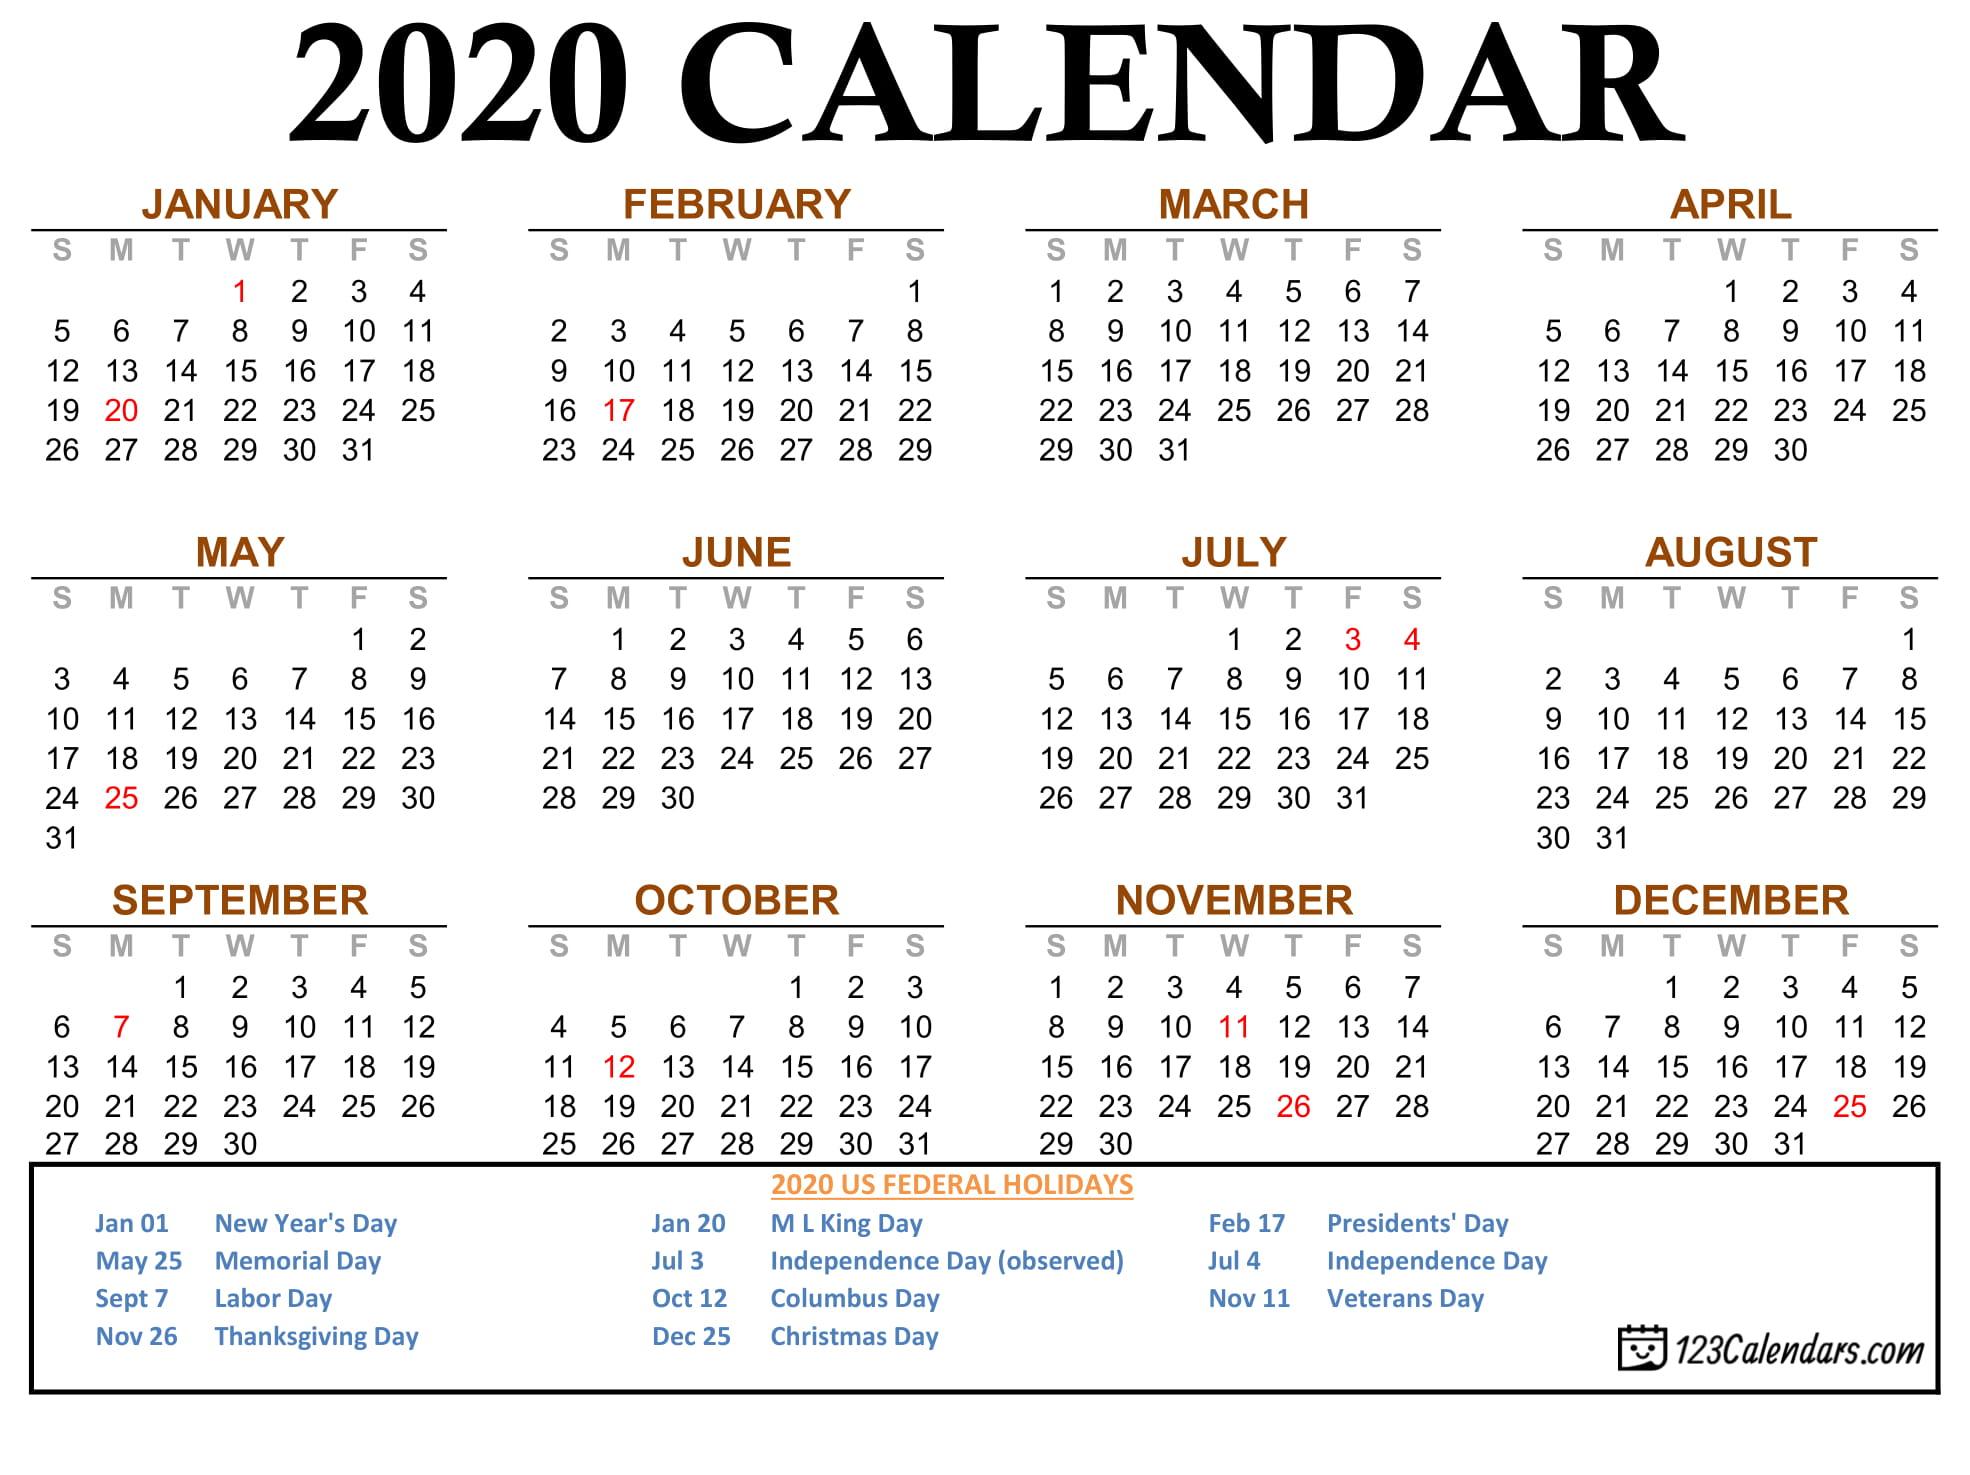 Free Printable 2020 Calendar | 123Calendars in Pocket Size Calendar Printable